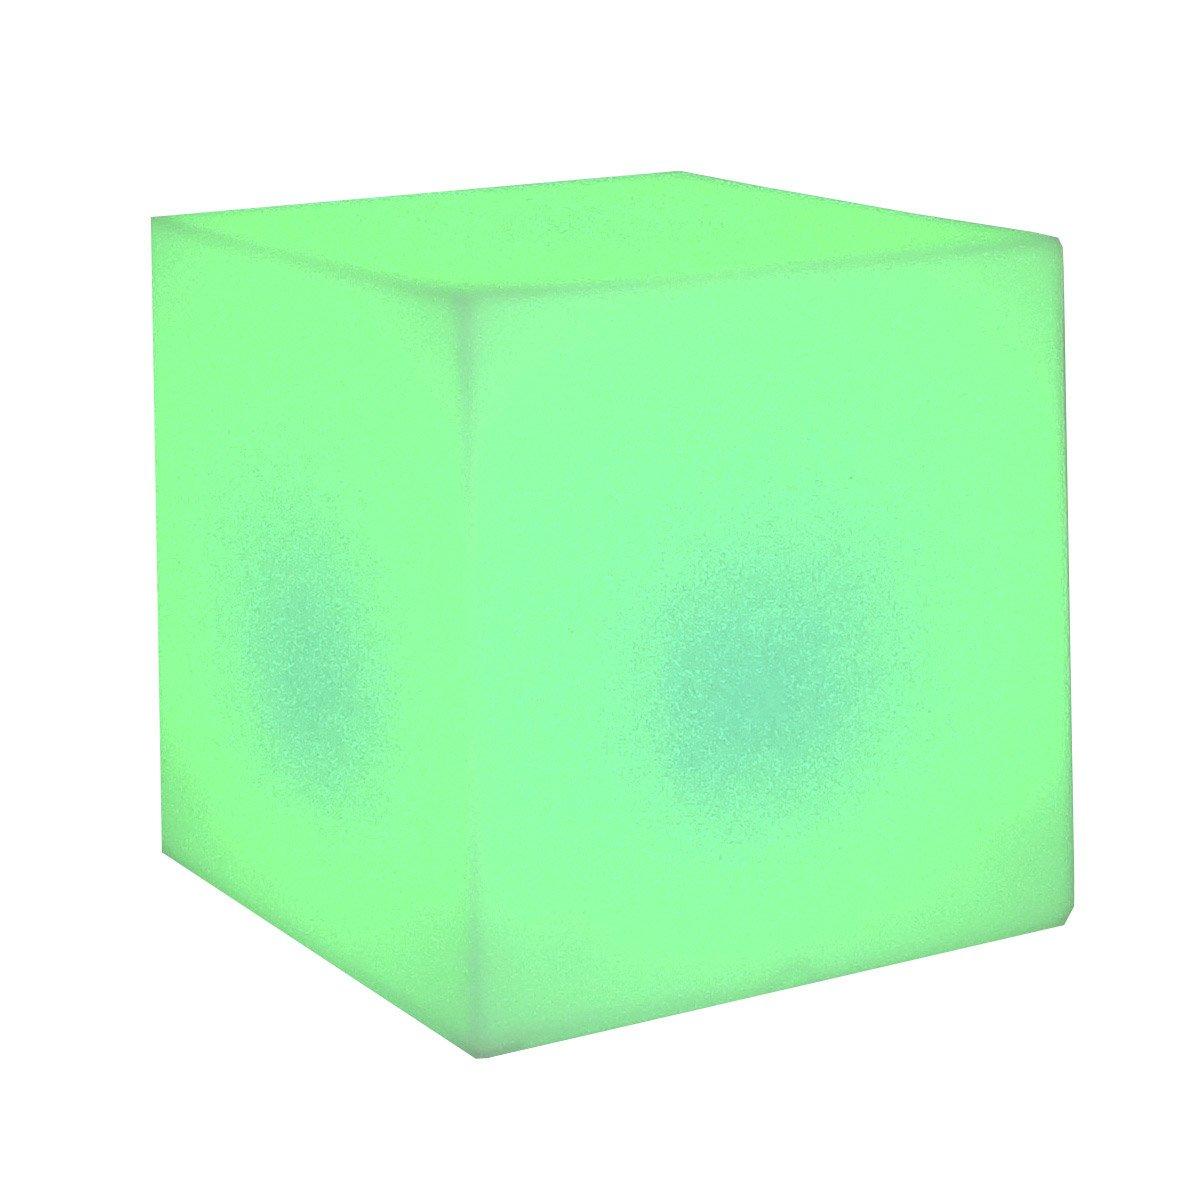 Cuby 55 kubus iluminado im Freien batería recargable LED RGB 43x43x53cm